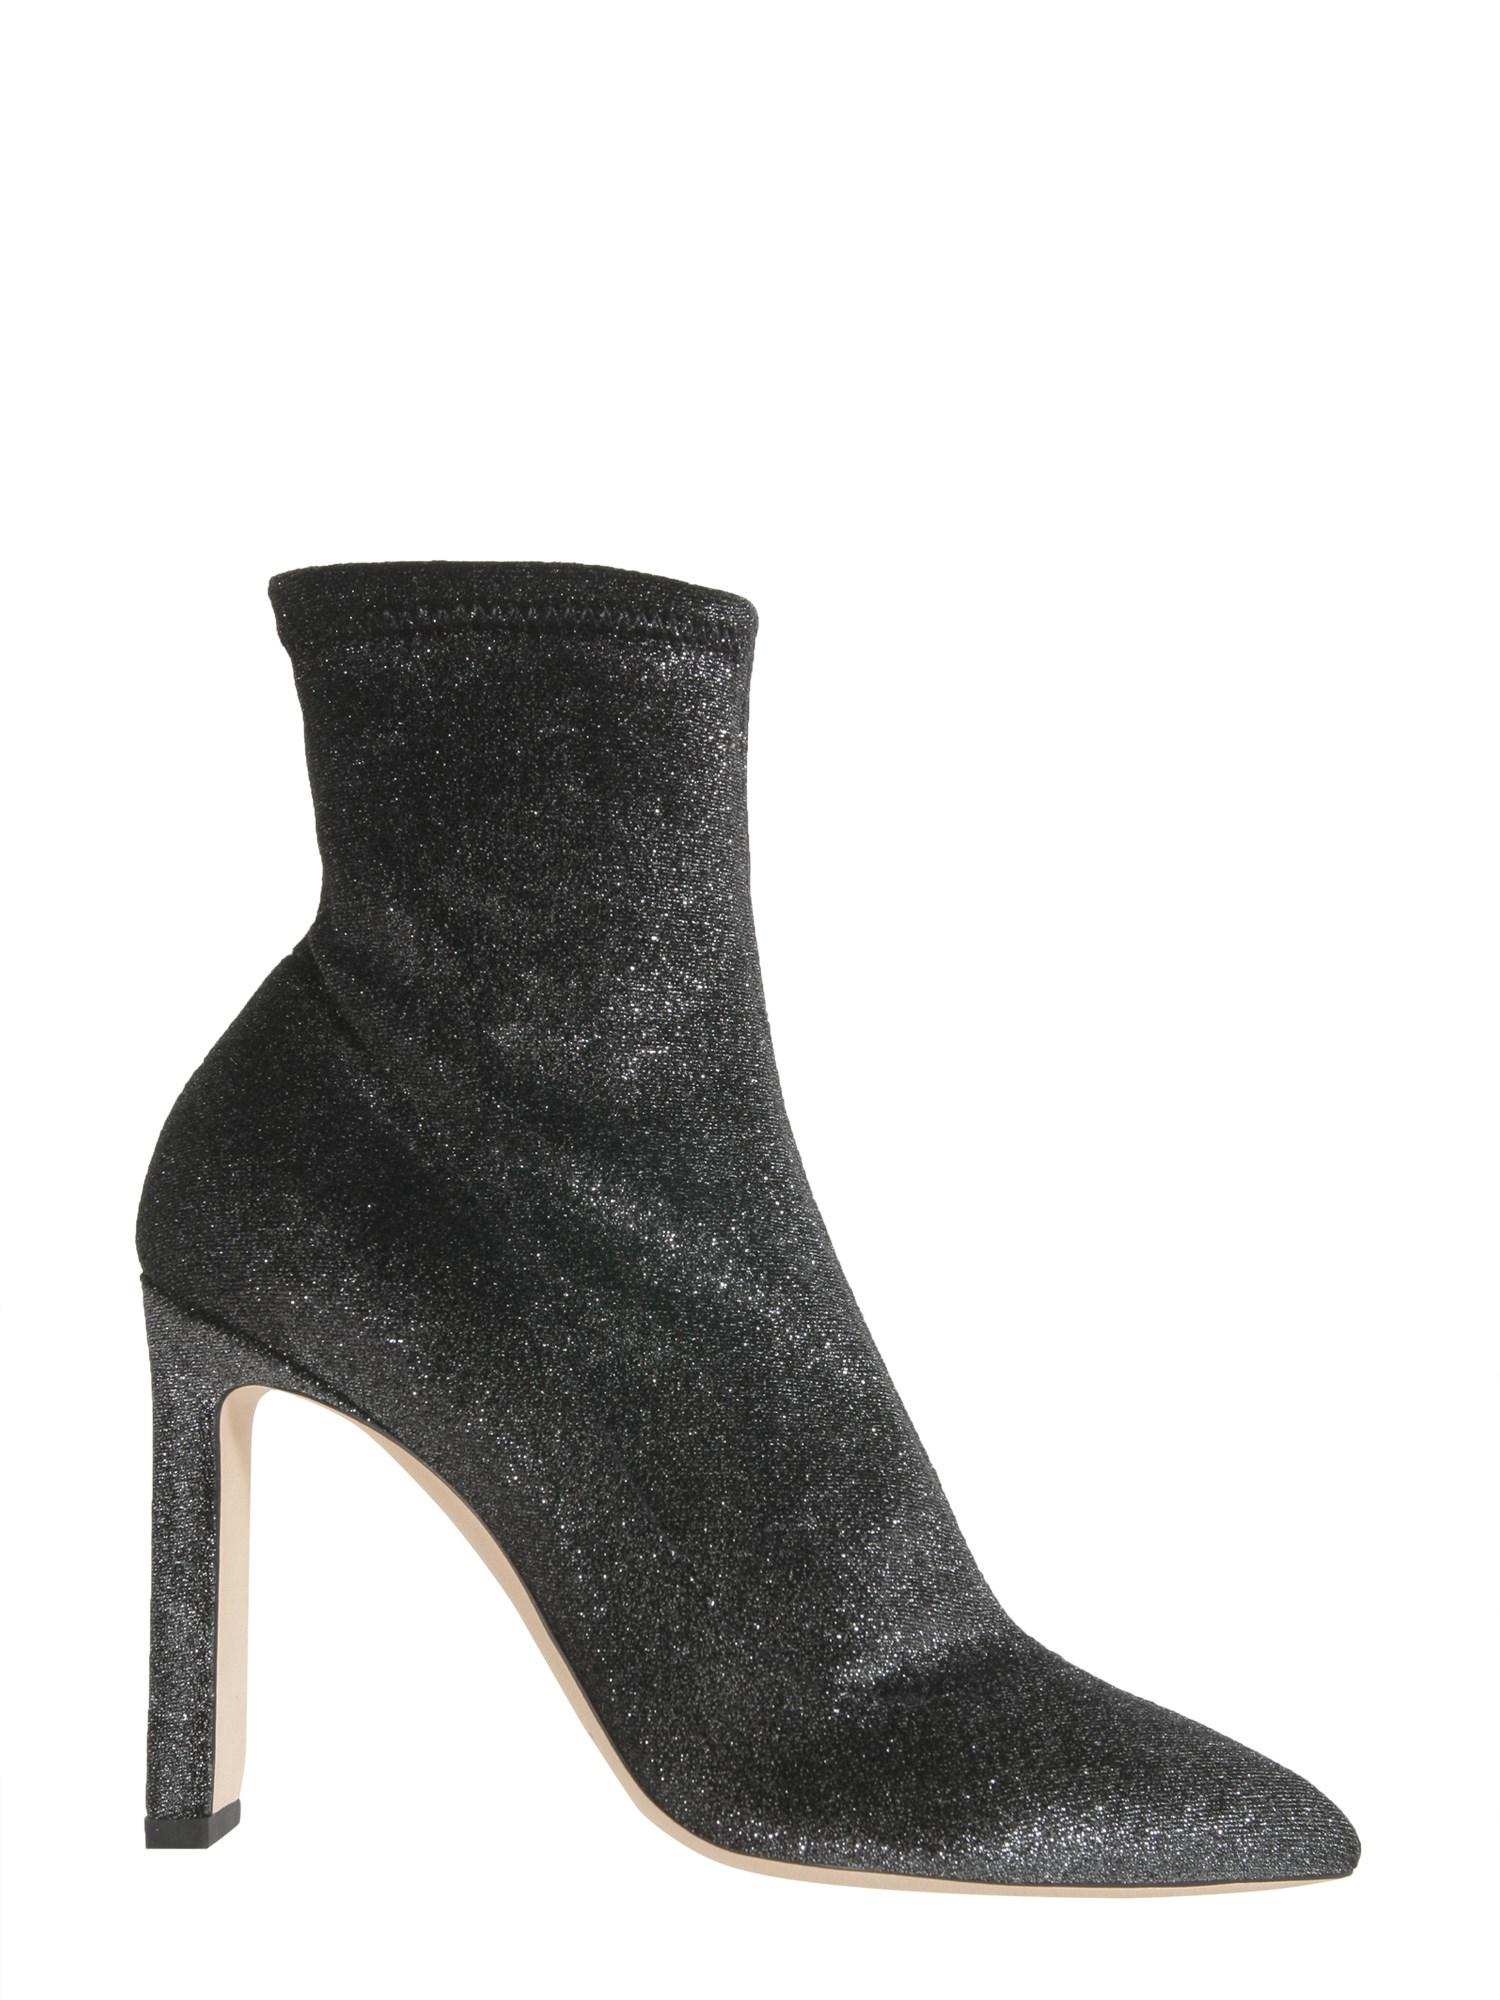 e9b7a76ccb28 Jimmy Choo Louella 100 Black Crushed Velvet Stretch Boot In Grey ...